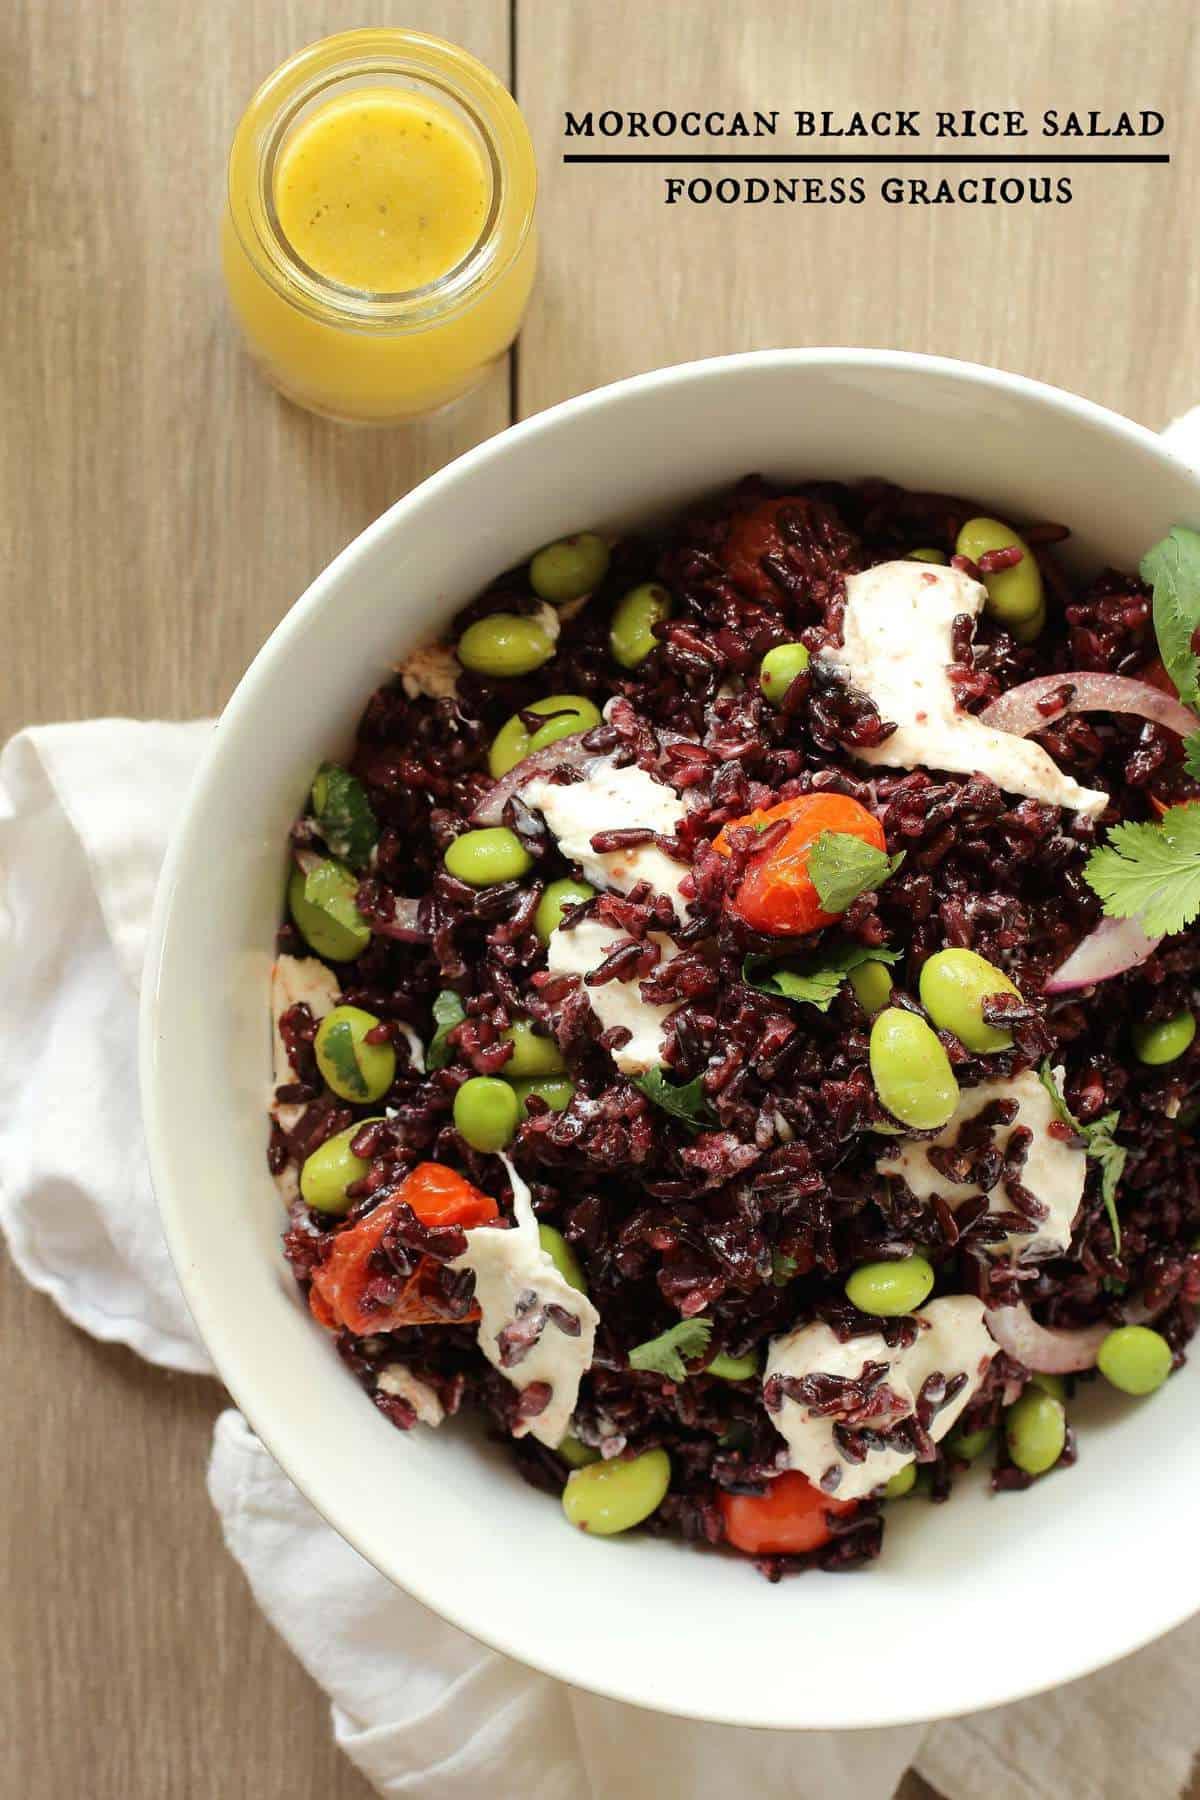 Moroccan Black Rice Salad